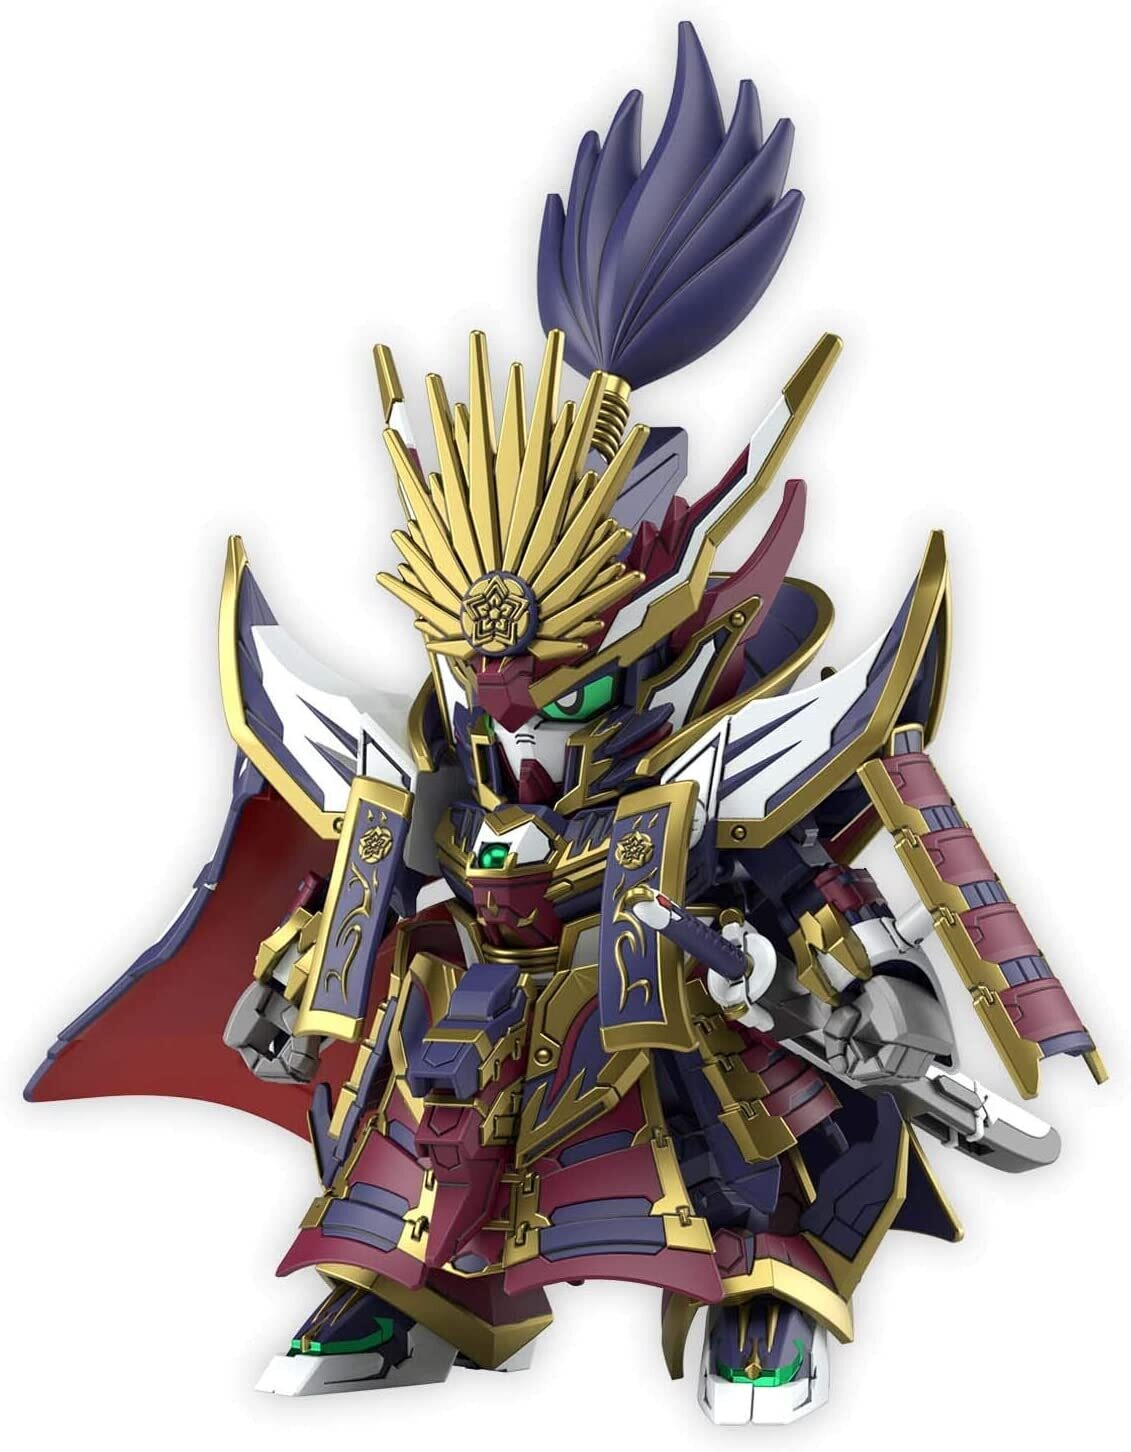 PRE-ORDER Bandai SDW Heroes Nobunaga Gundam Epyon Plastic Model Kit